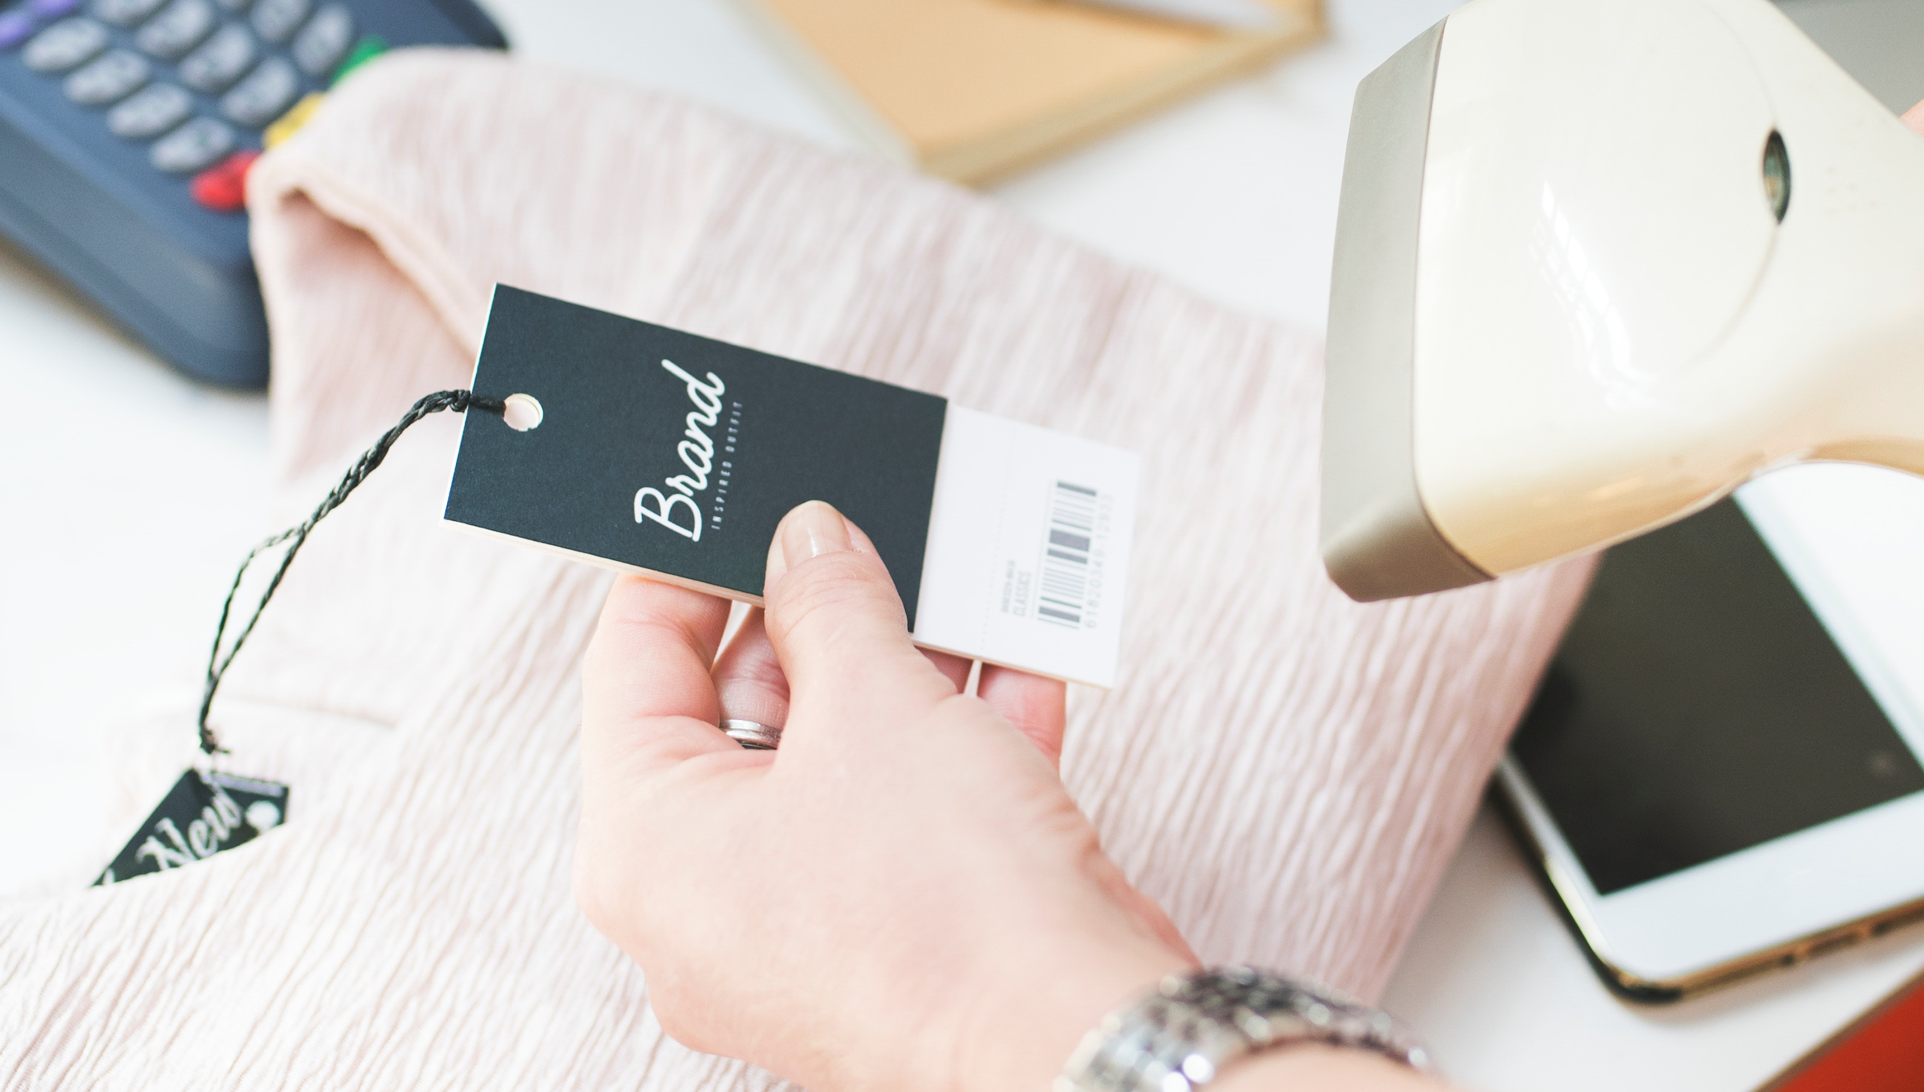 Payment methods, retail, tecnologia, comercio minorista